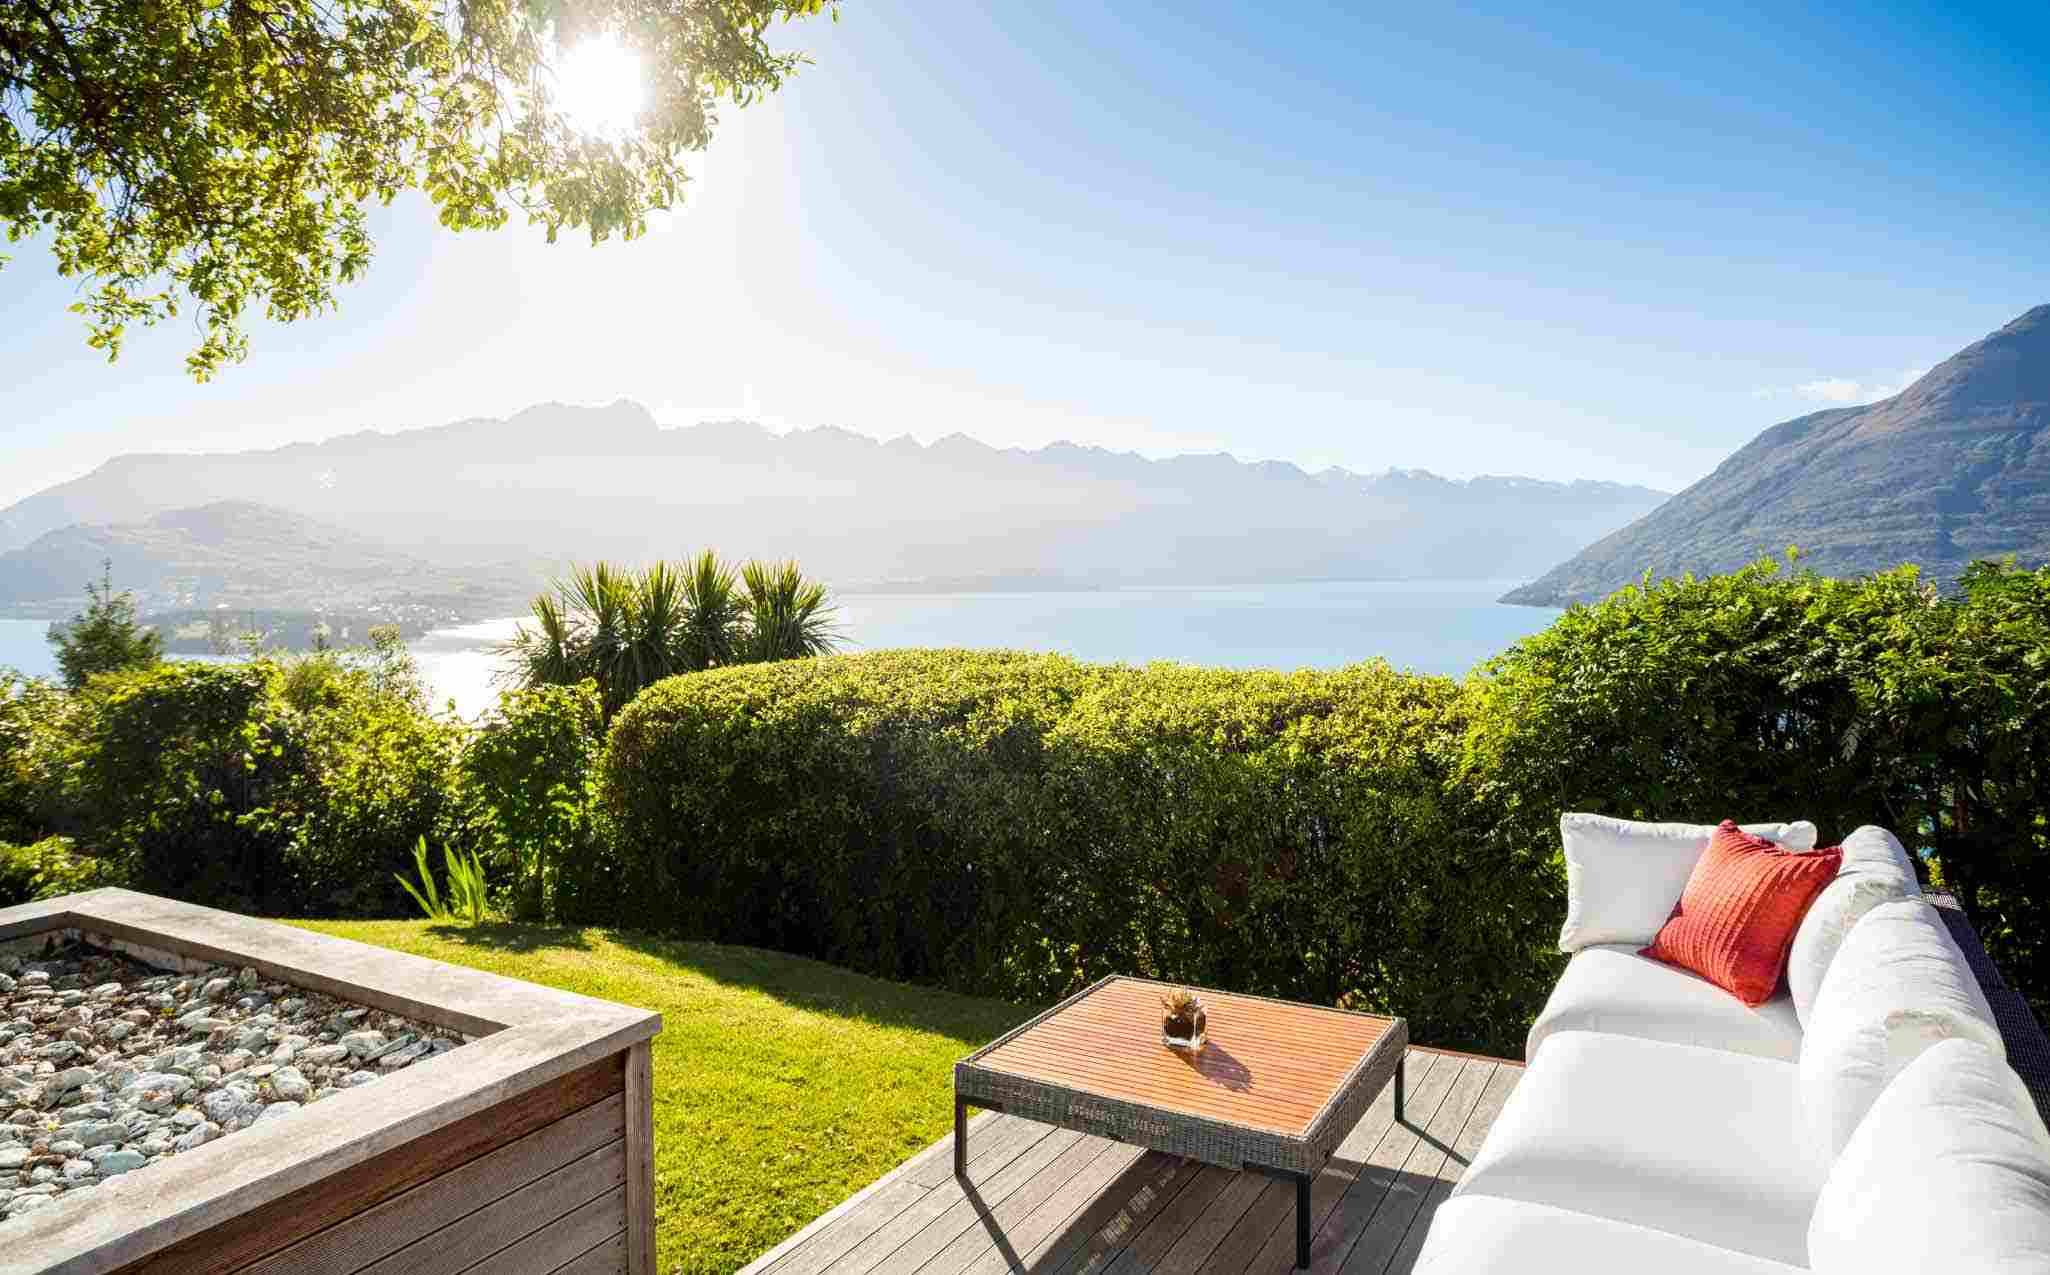 Azur Lodge Outdoor